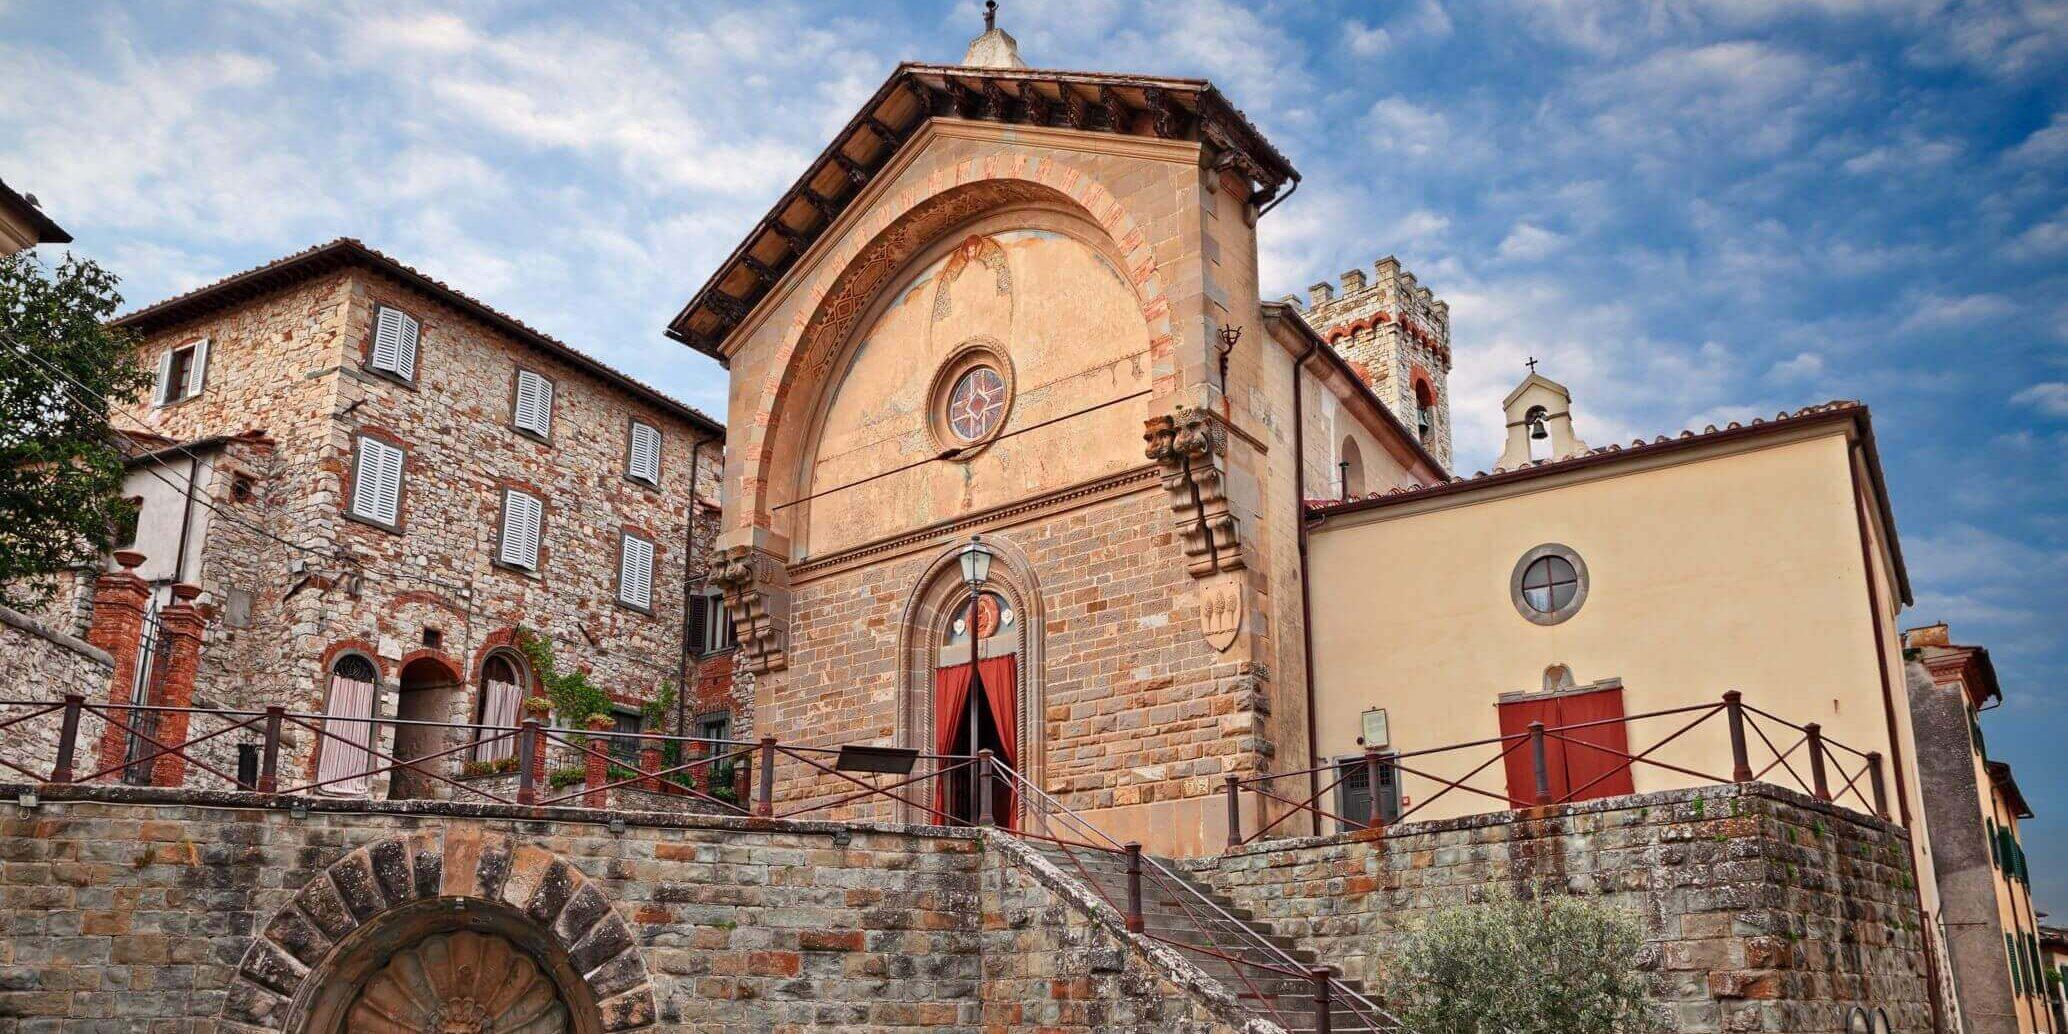 28-VisitChianti-Propositura-di-San Niccolo-Radda-in-chianti-toscana-shutterstock_1253689087-2068x1490